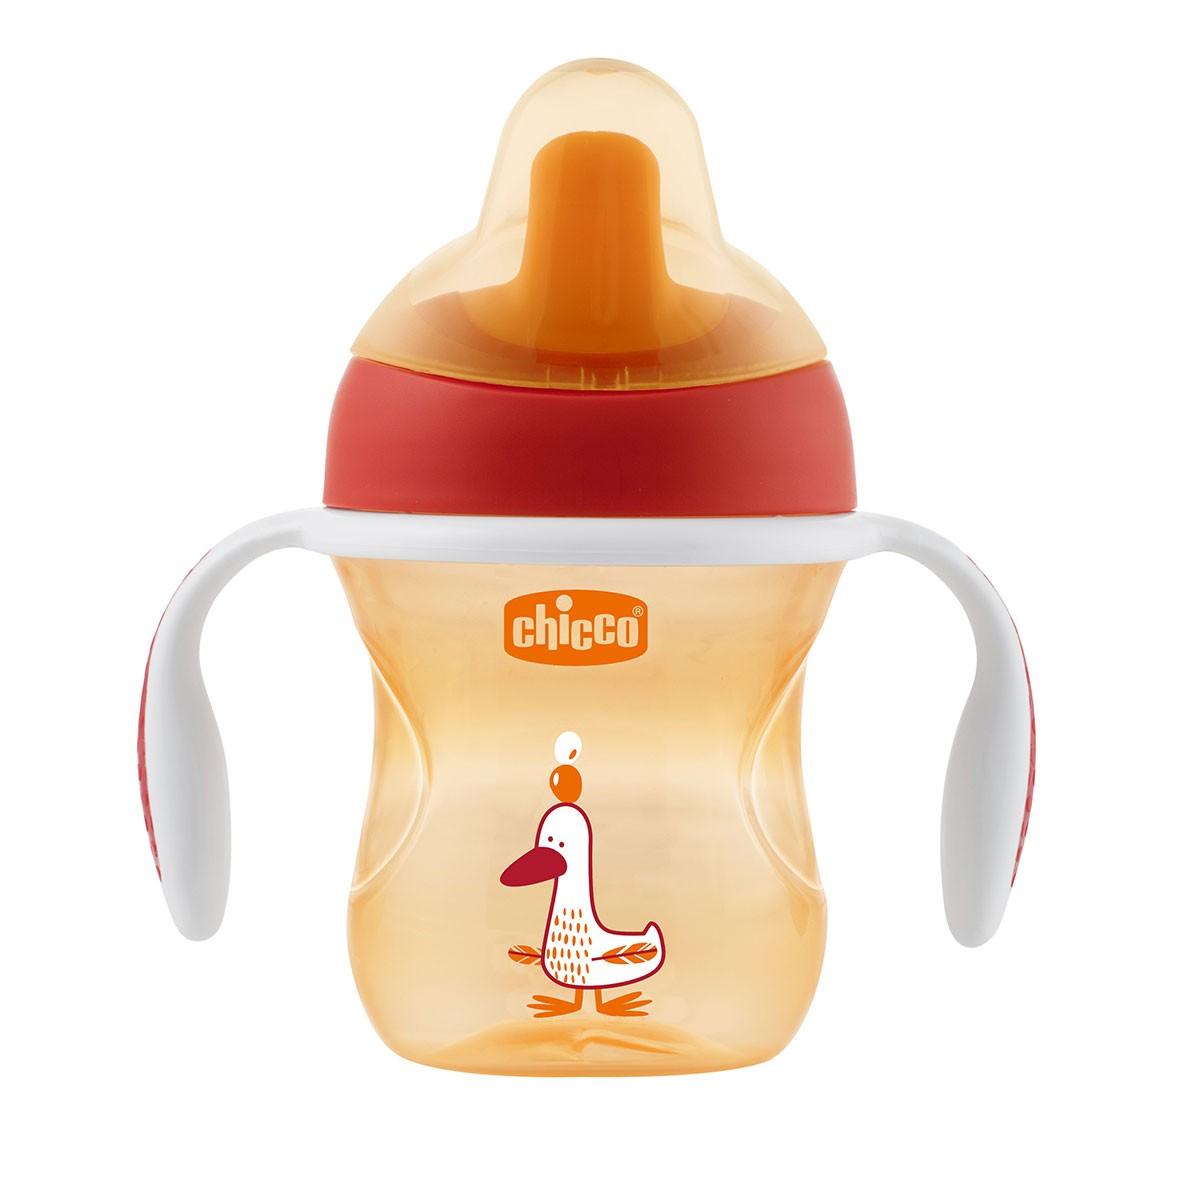 Chicco Training Trinklernbecher 6M+ Orange